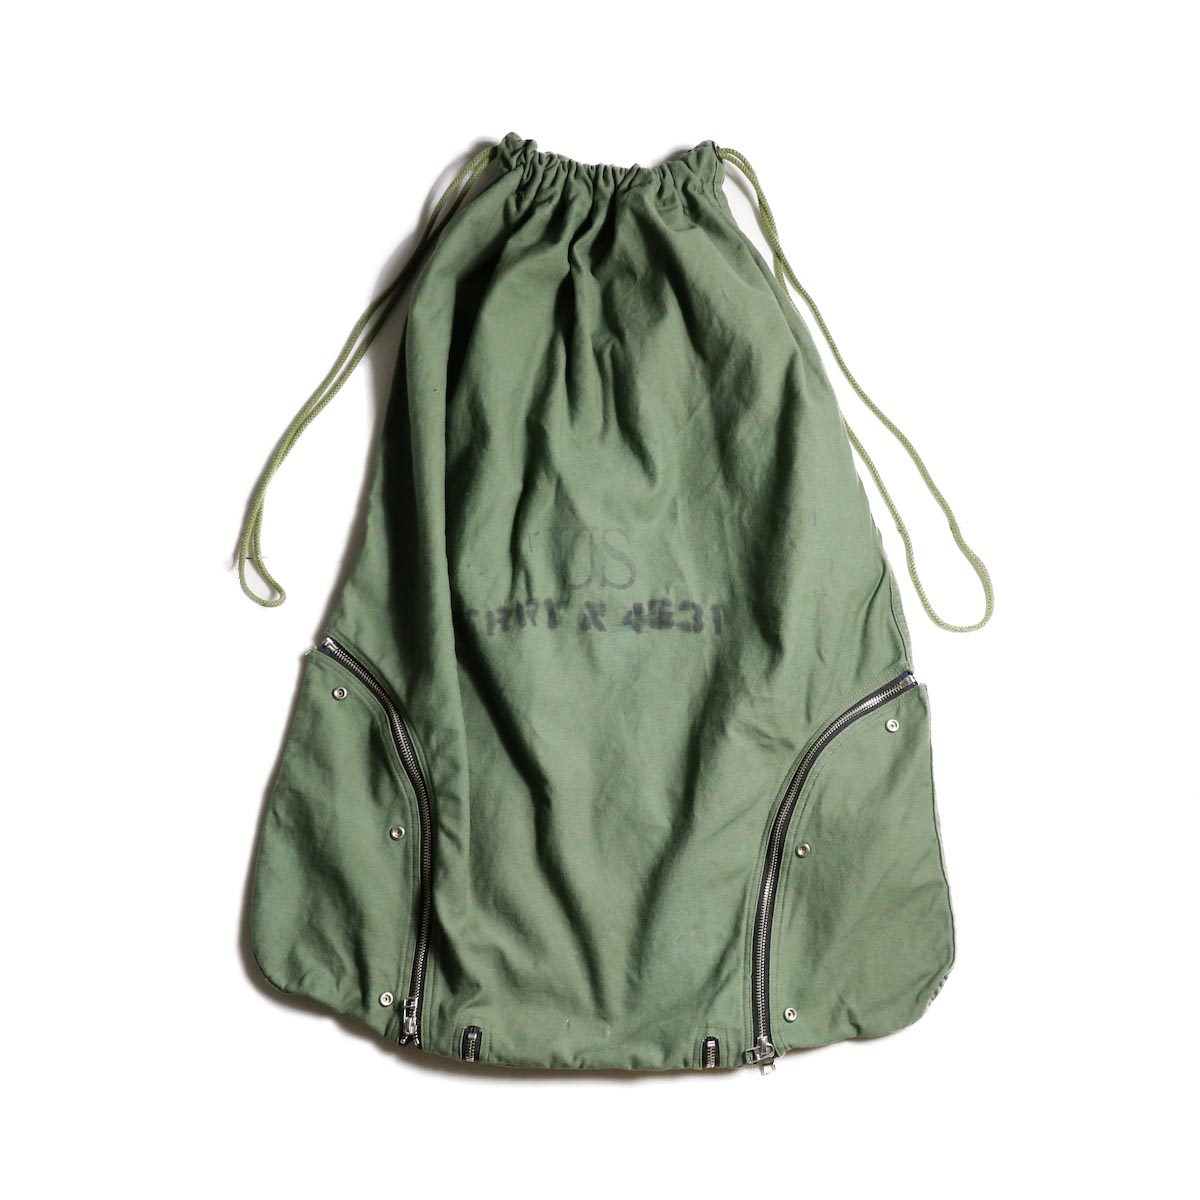 OLD PARK / LAUNDRY VEST BAG -Military ランドリーバッグ